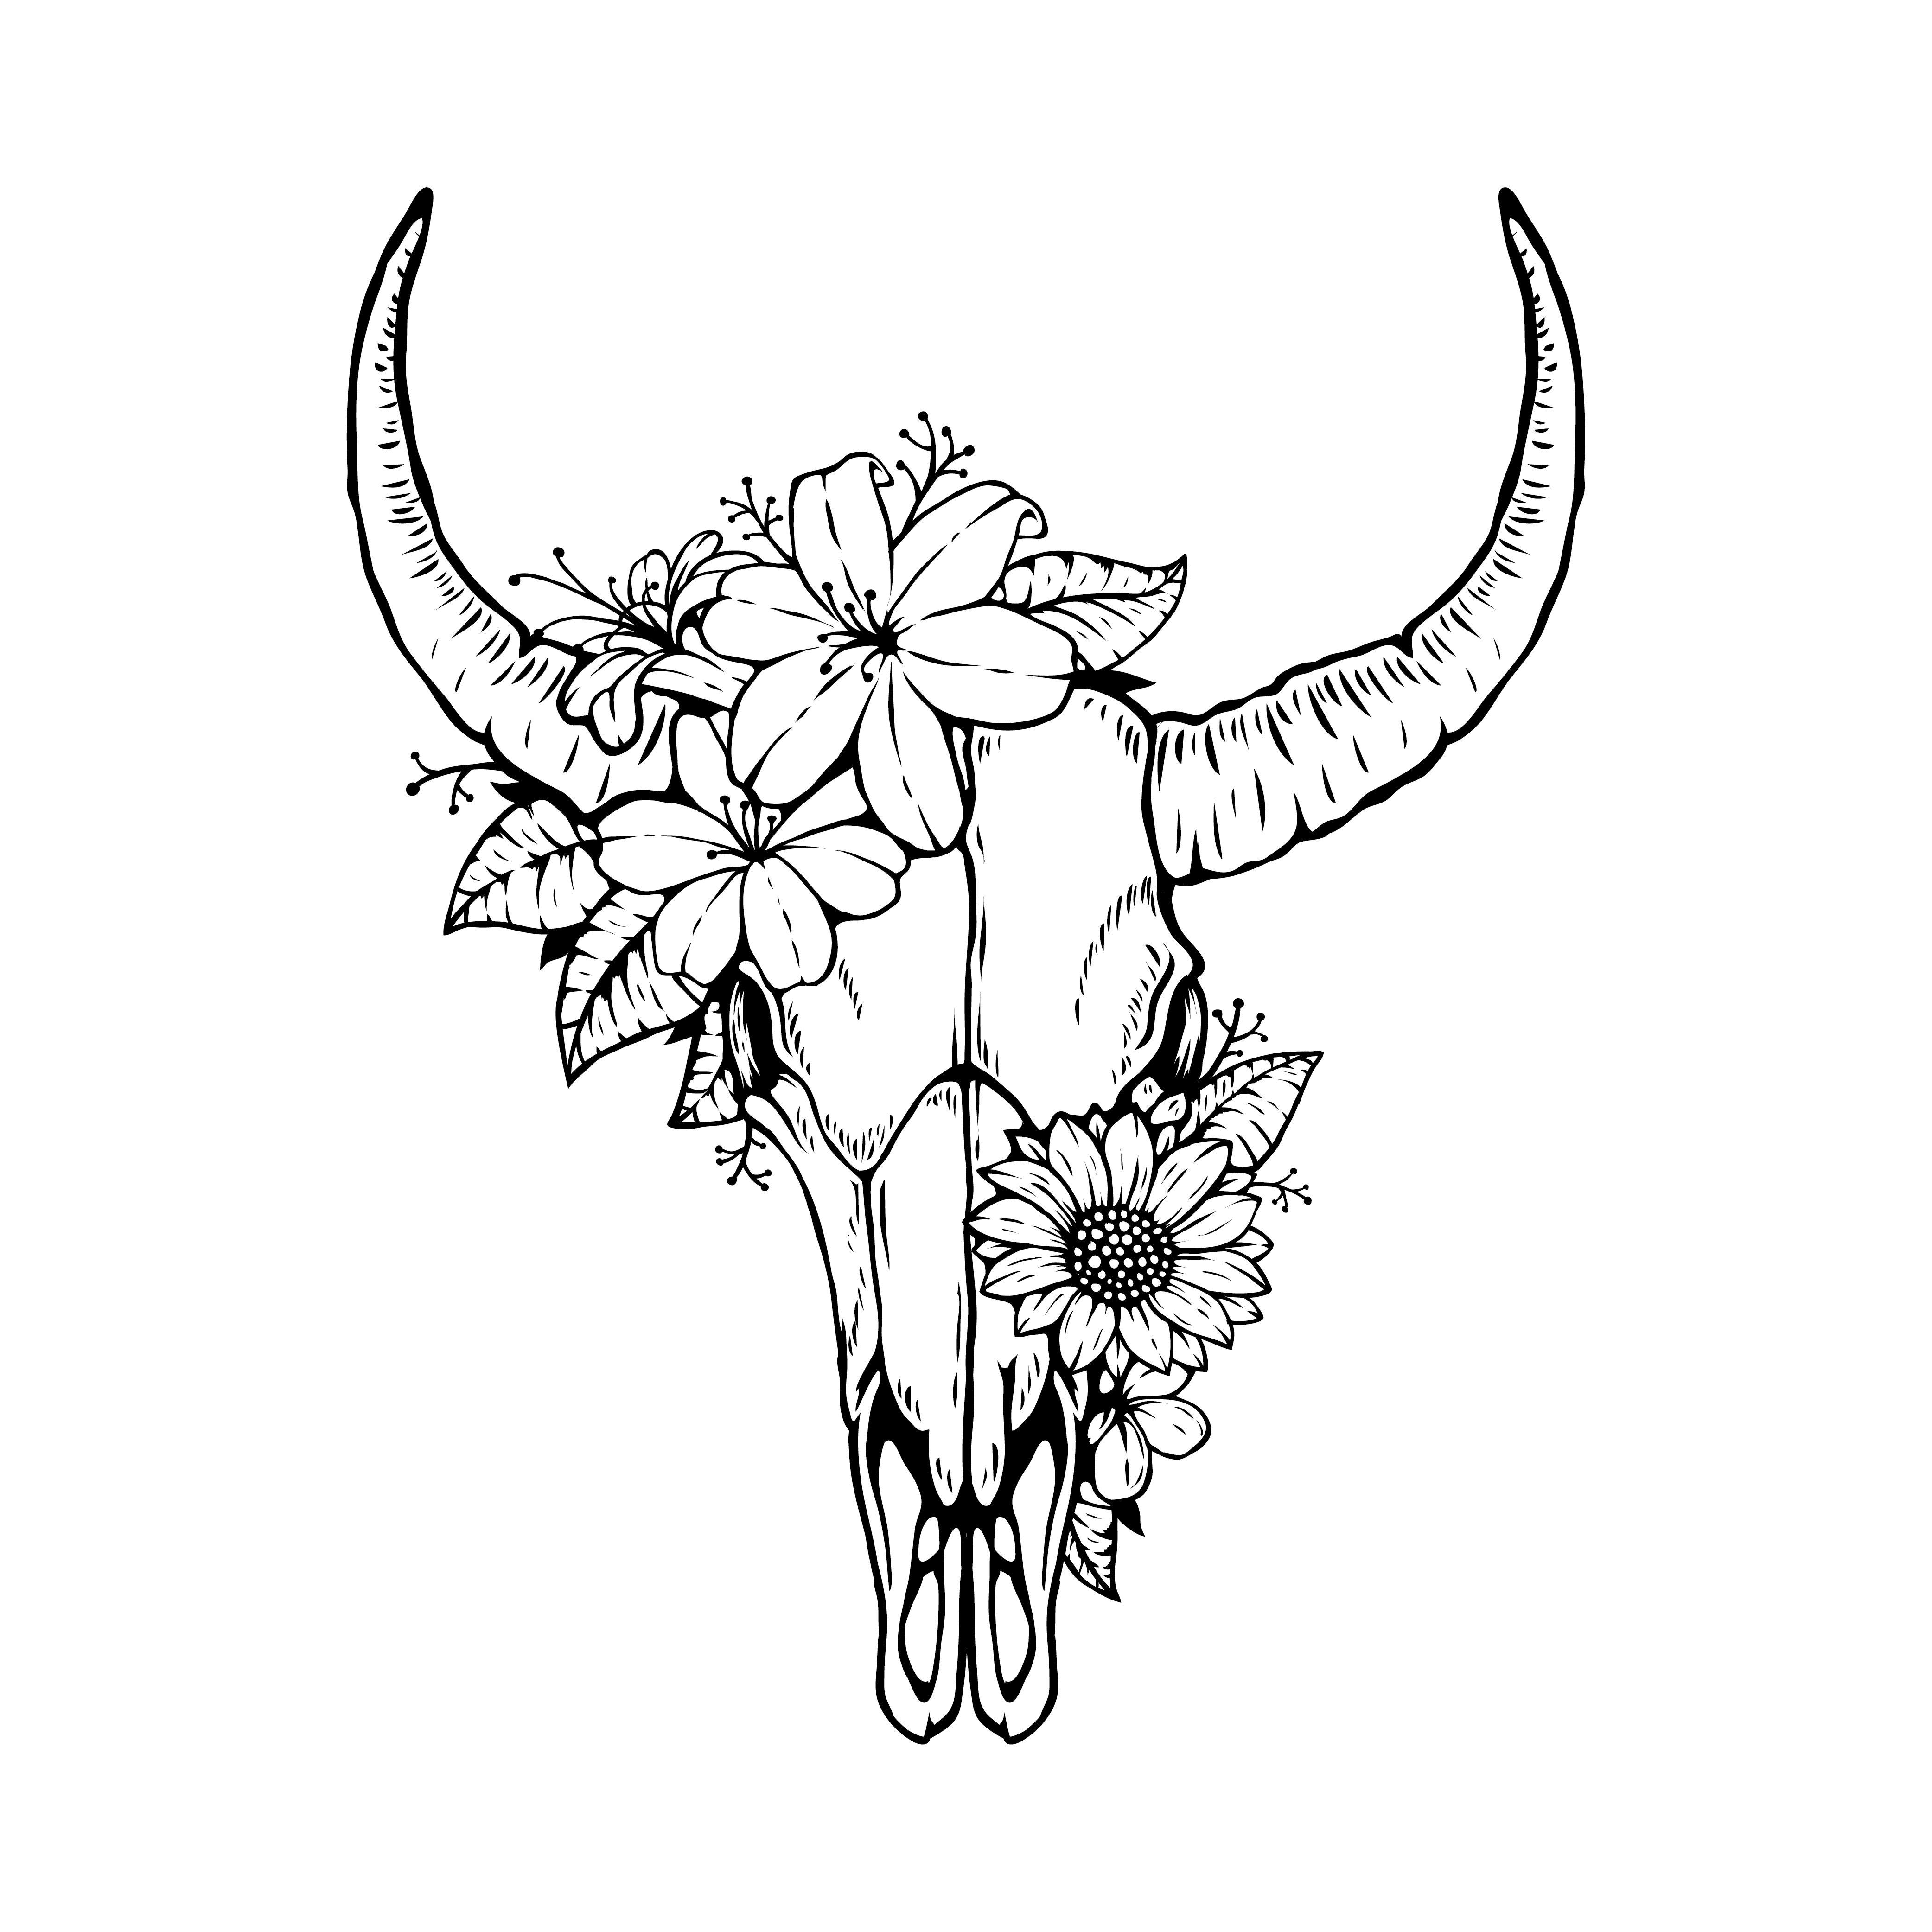 animal bull skull head with floral design